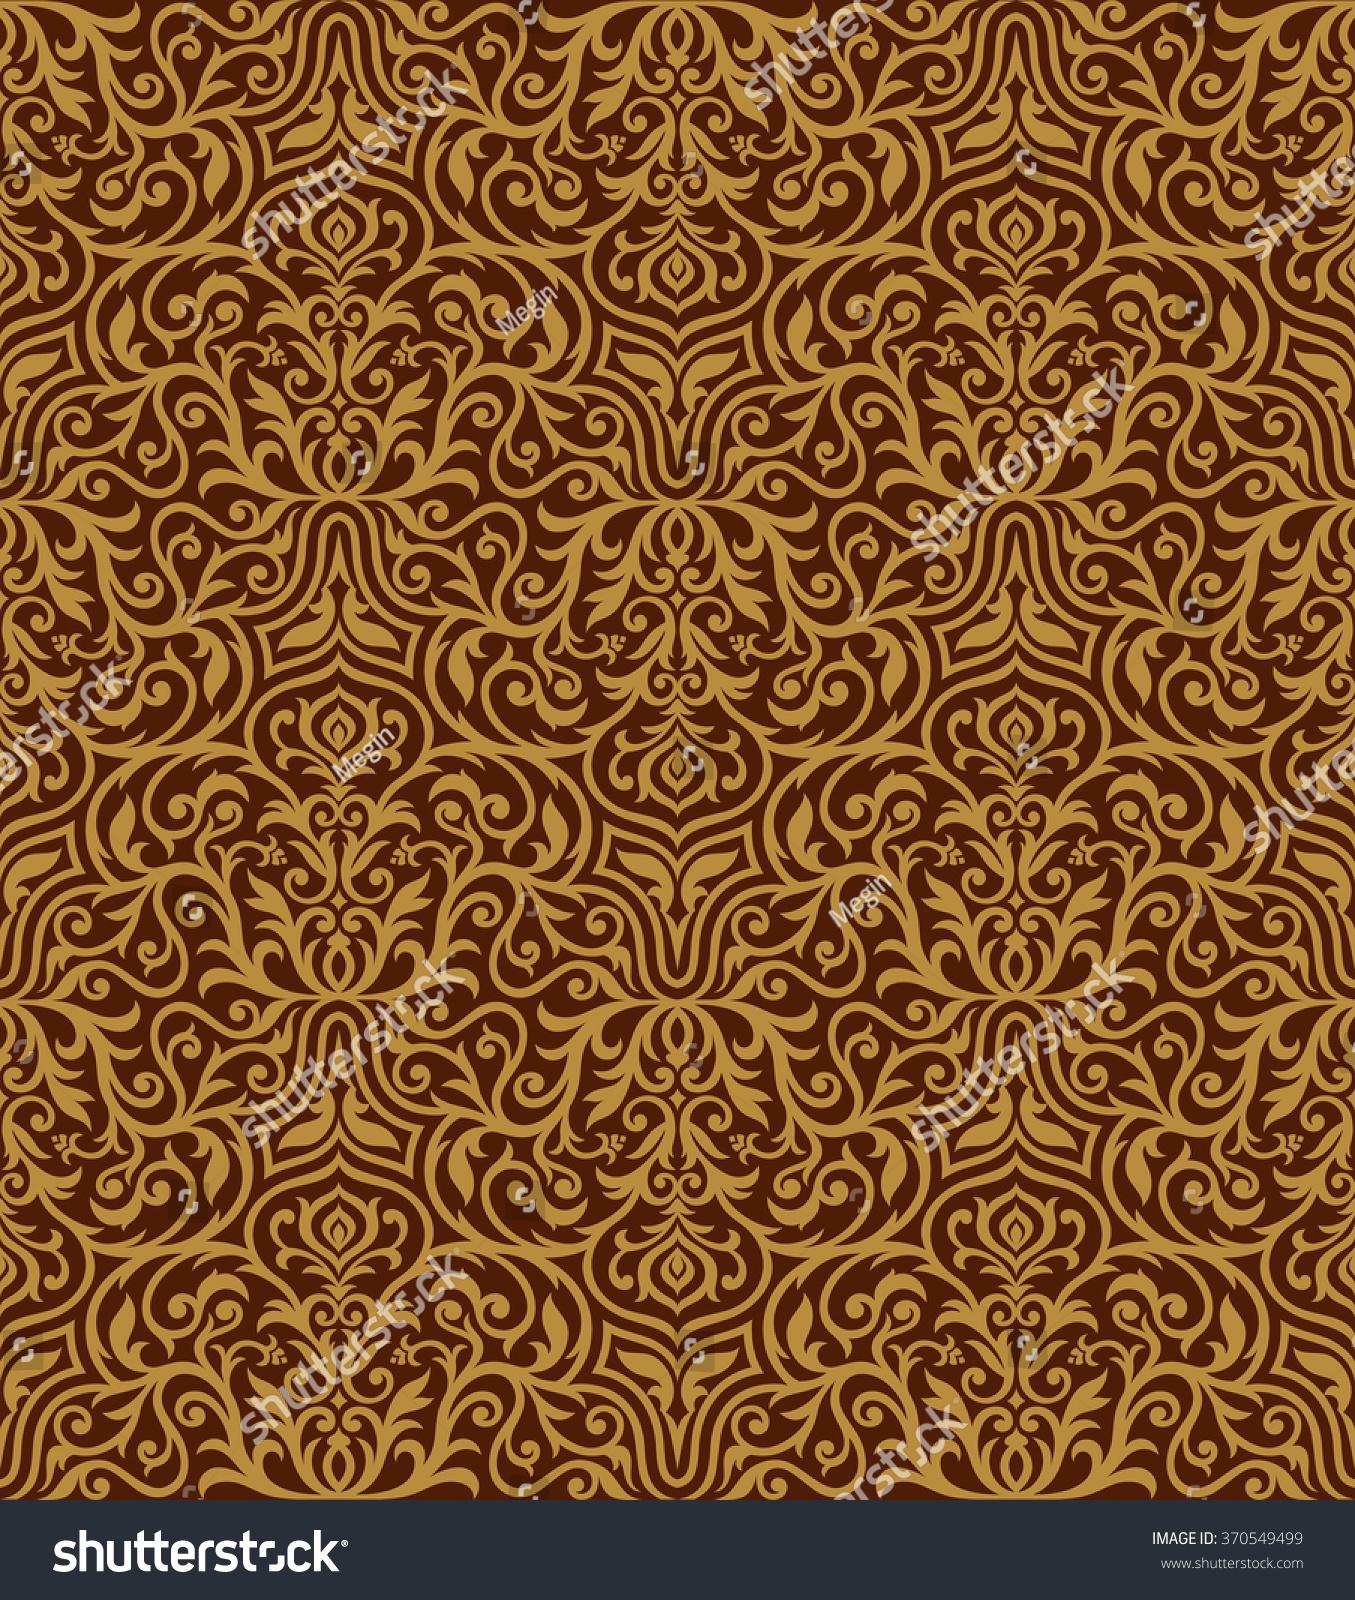 swirling royal pattern wallpaper - photo #7